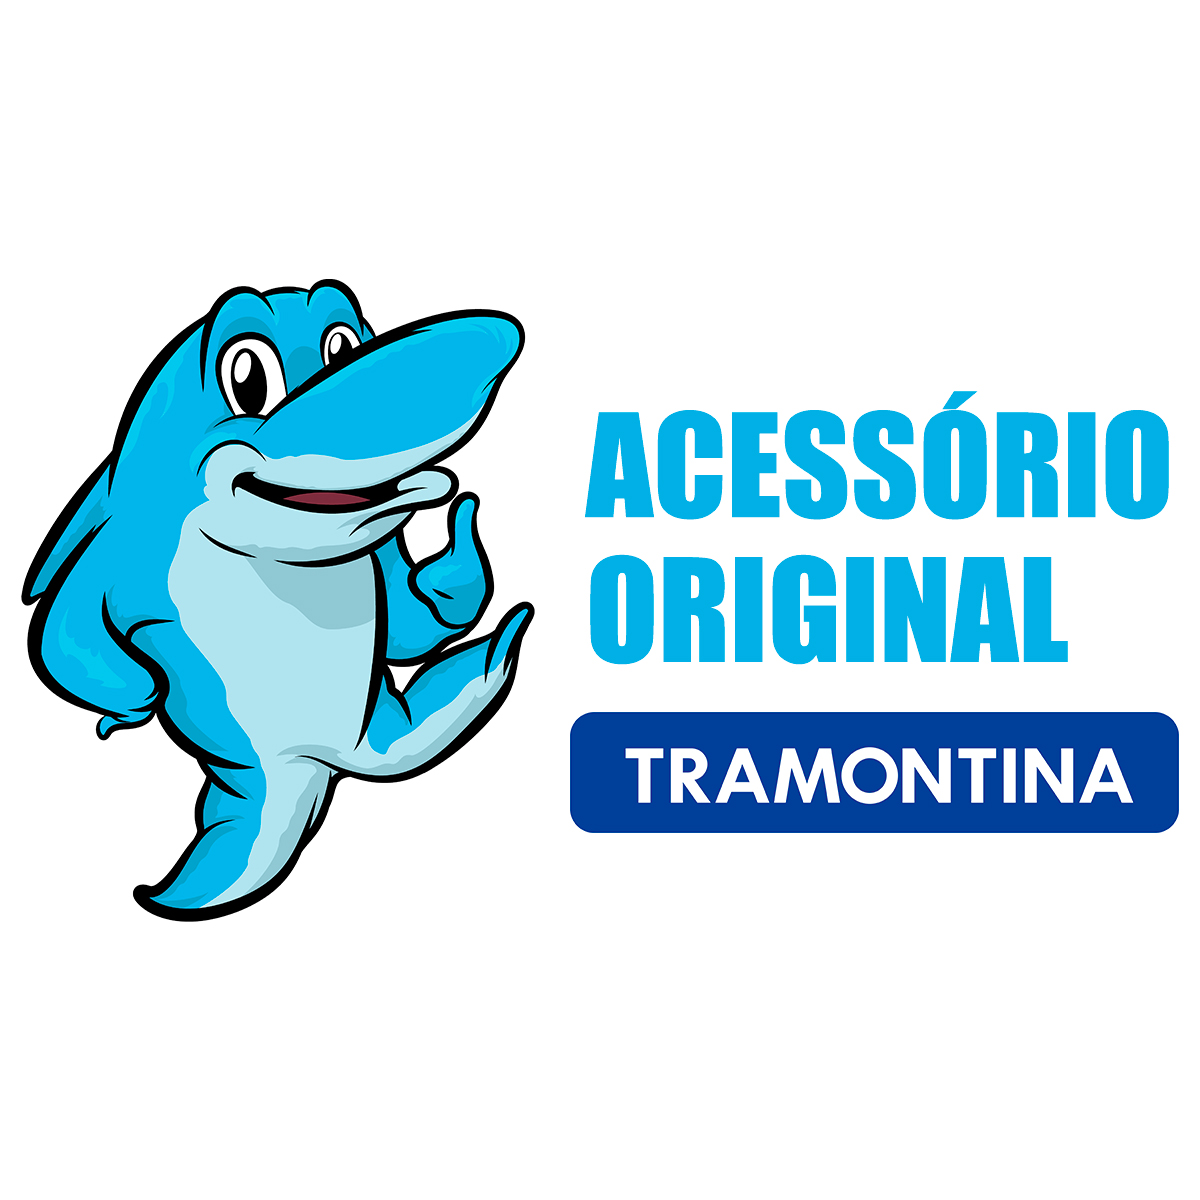 Kit Completo Mangueira, Pistola, Baioneta e lança para Lavadora Tramontina 1500psi 1200w, 1600psi 1400w Original